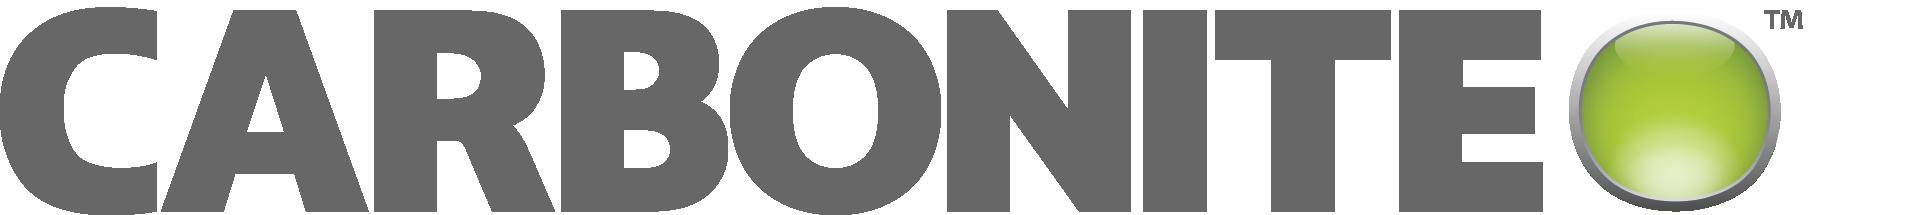 CARBONITE-logo-solo-RGB-11.19.14.png